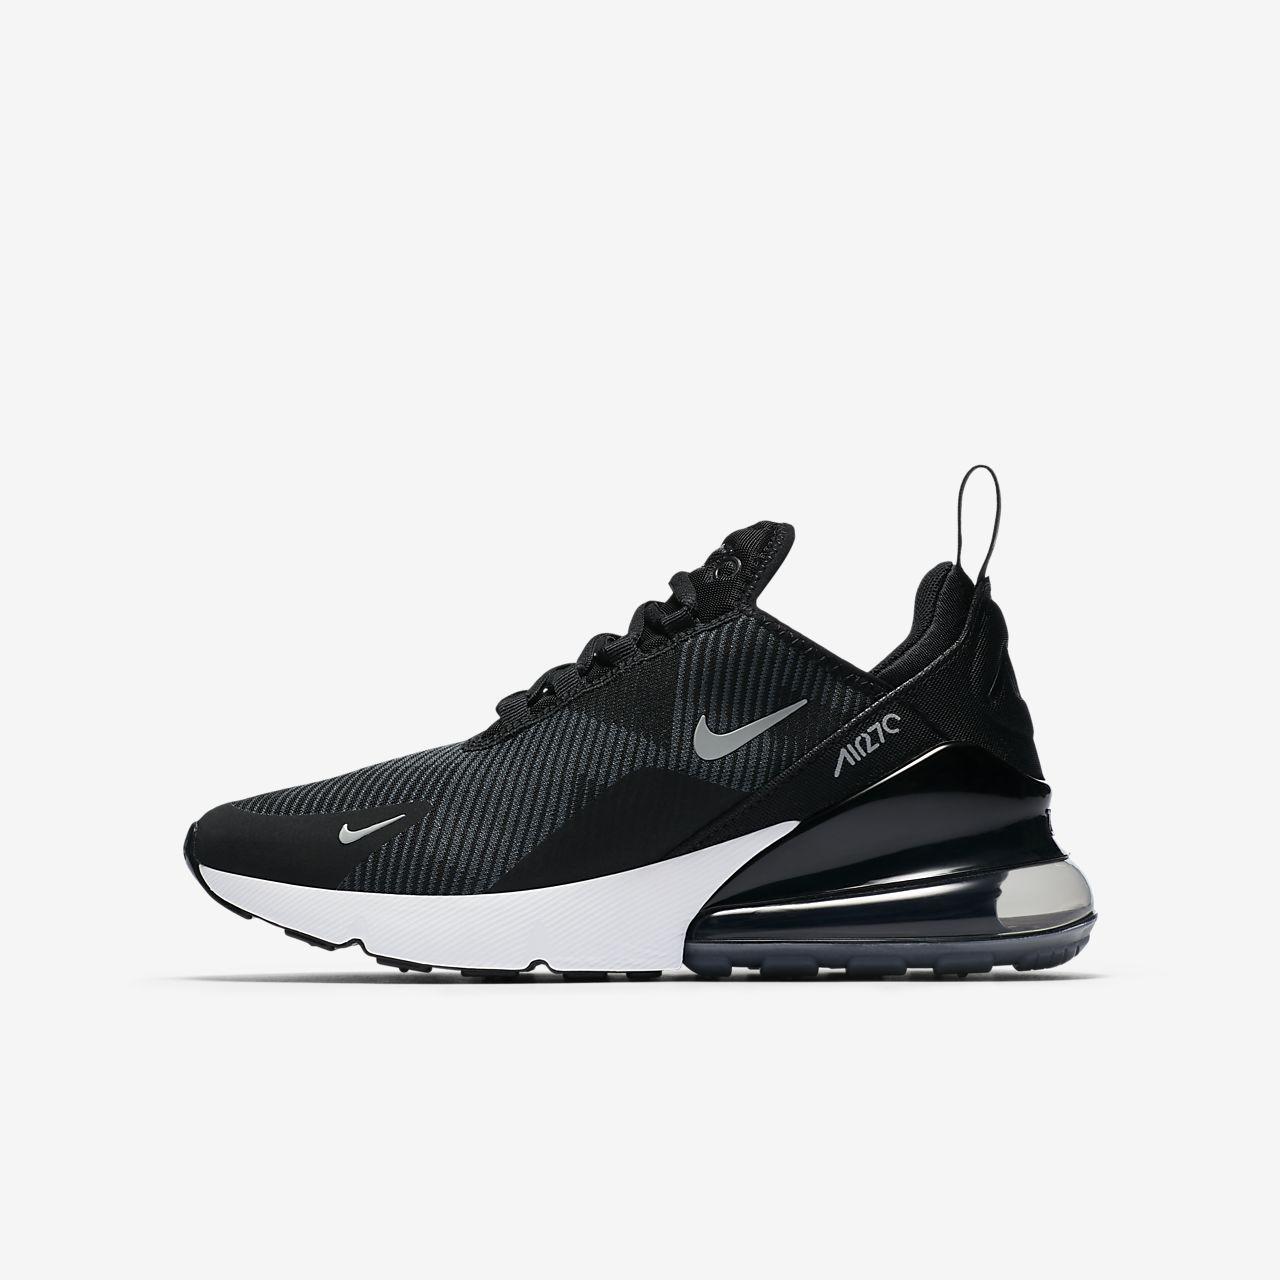 Nike Air Max 270 Jacquard Shoe